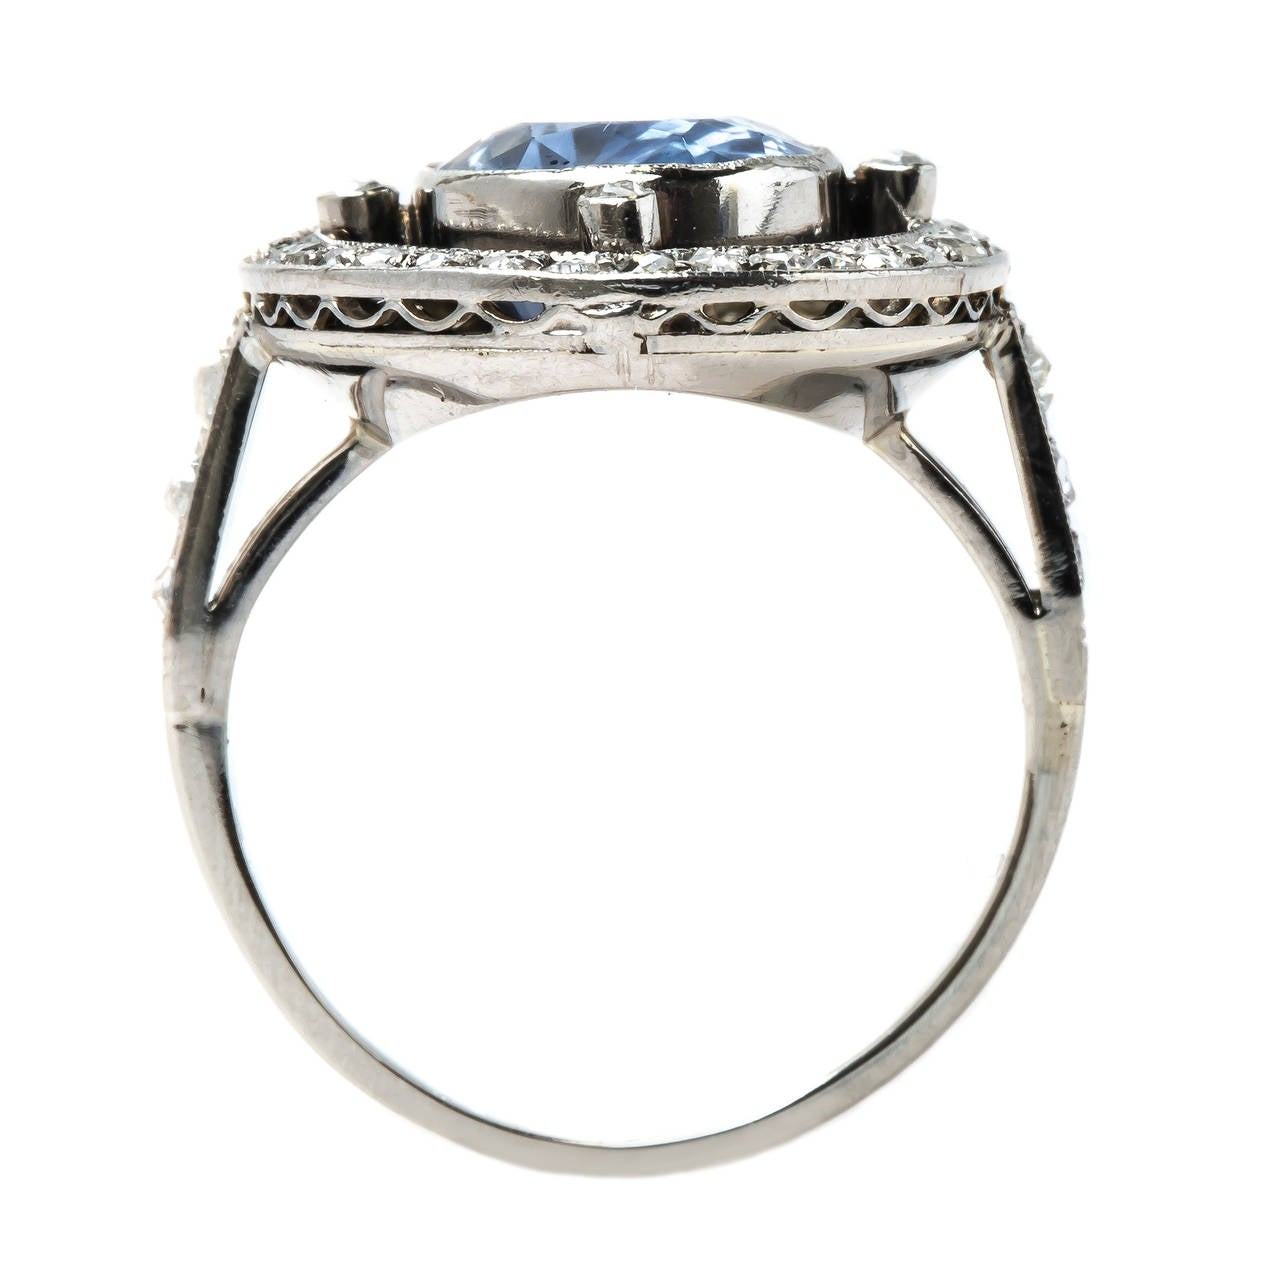 late deco sri lankan sapphire engagement ring at 1stdibs